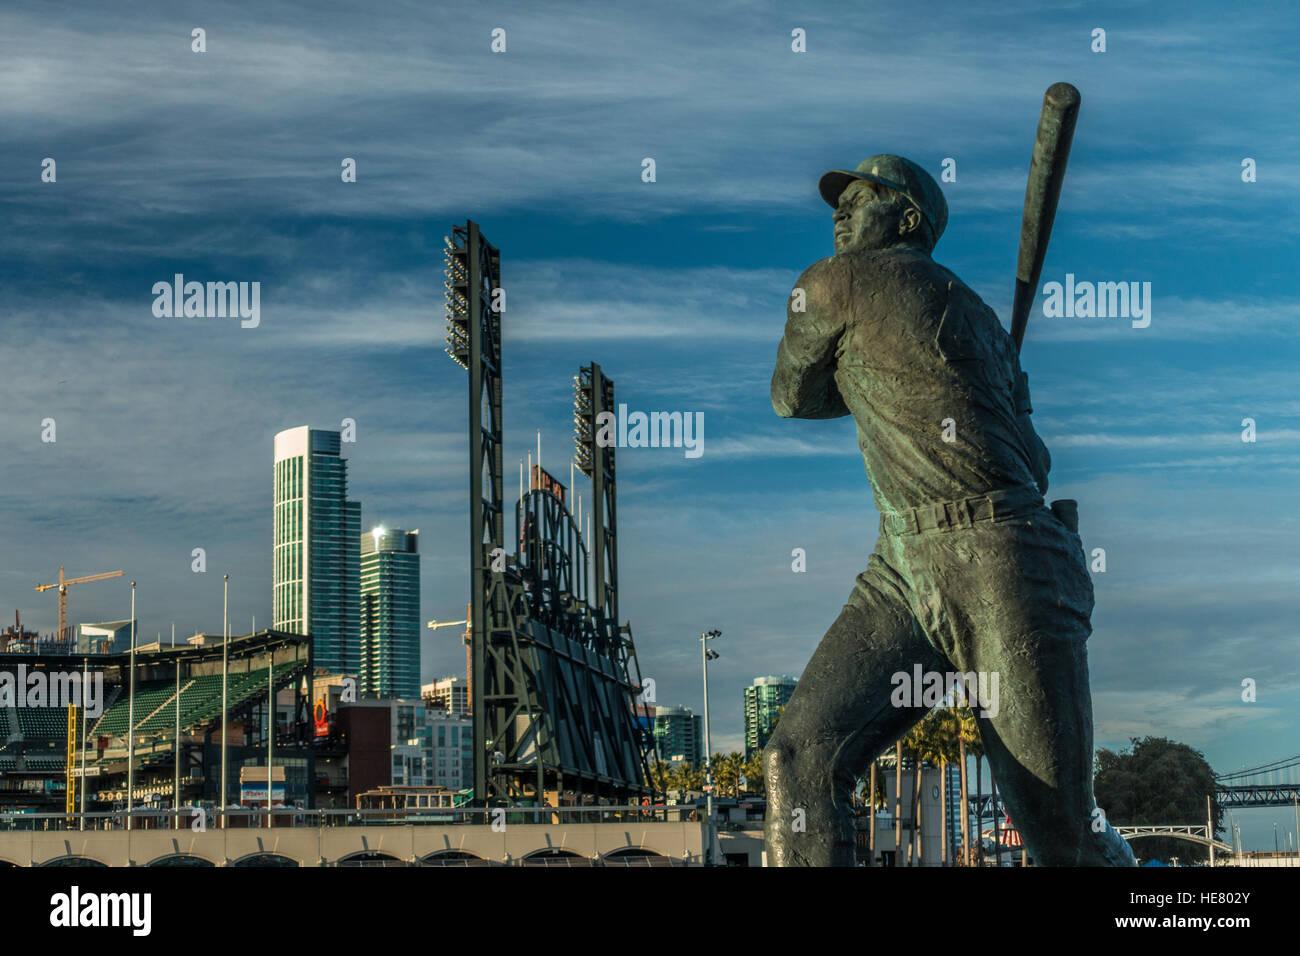 Statua di Willie McCovey lungo San Francisco Giants Stadium, AT&T Park Immagini Stock